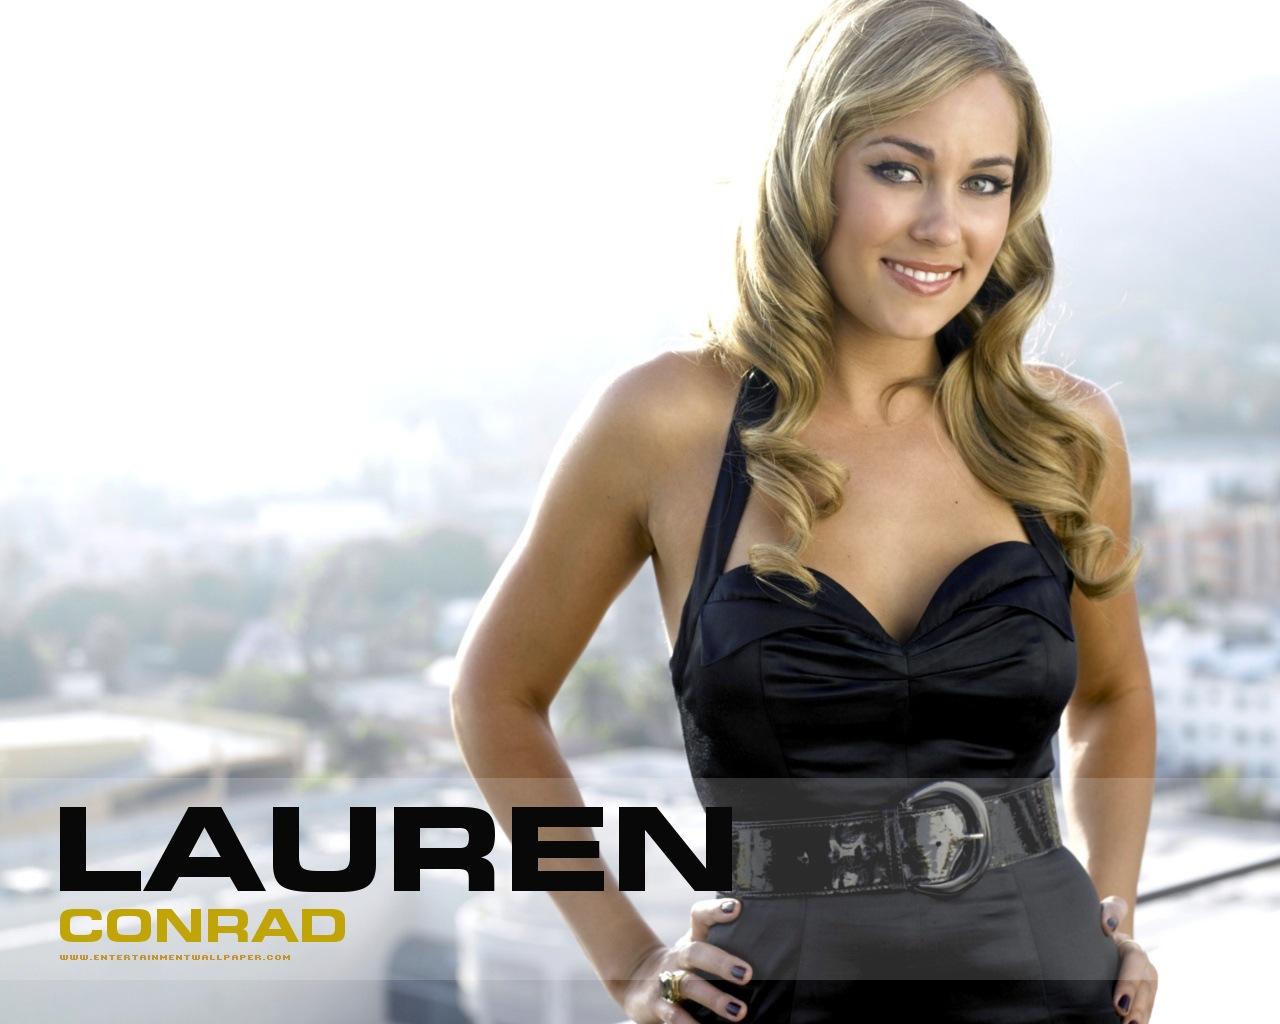 http://images.fanpop.com/images/image_uploads/Lauren-Conrad--lauren-conrad-645255_1280_1024.jpg